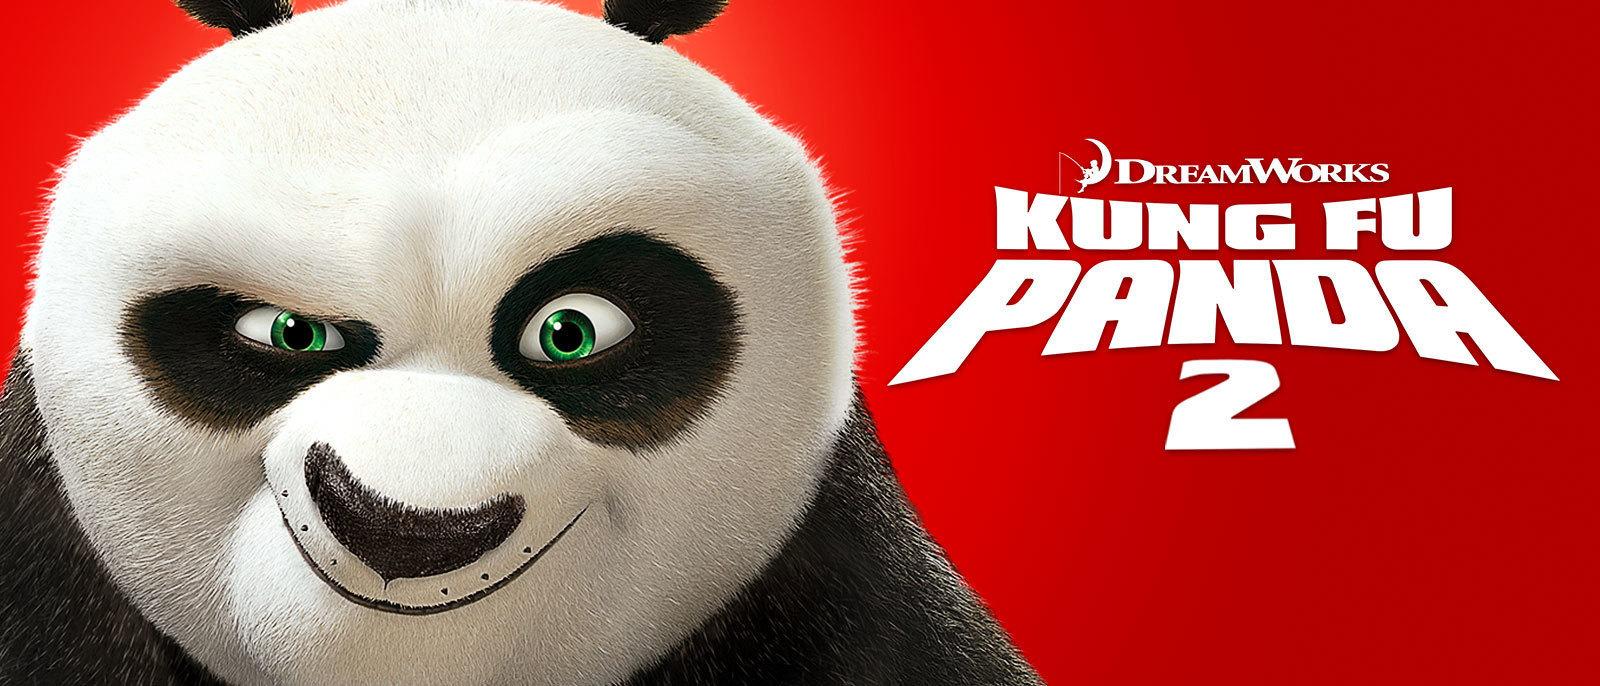 Kung Fu Panda 2 (2011) – Dolby Digital Plus 5.1